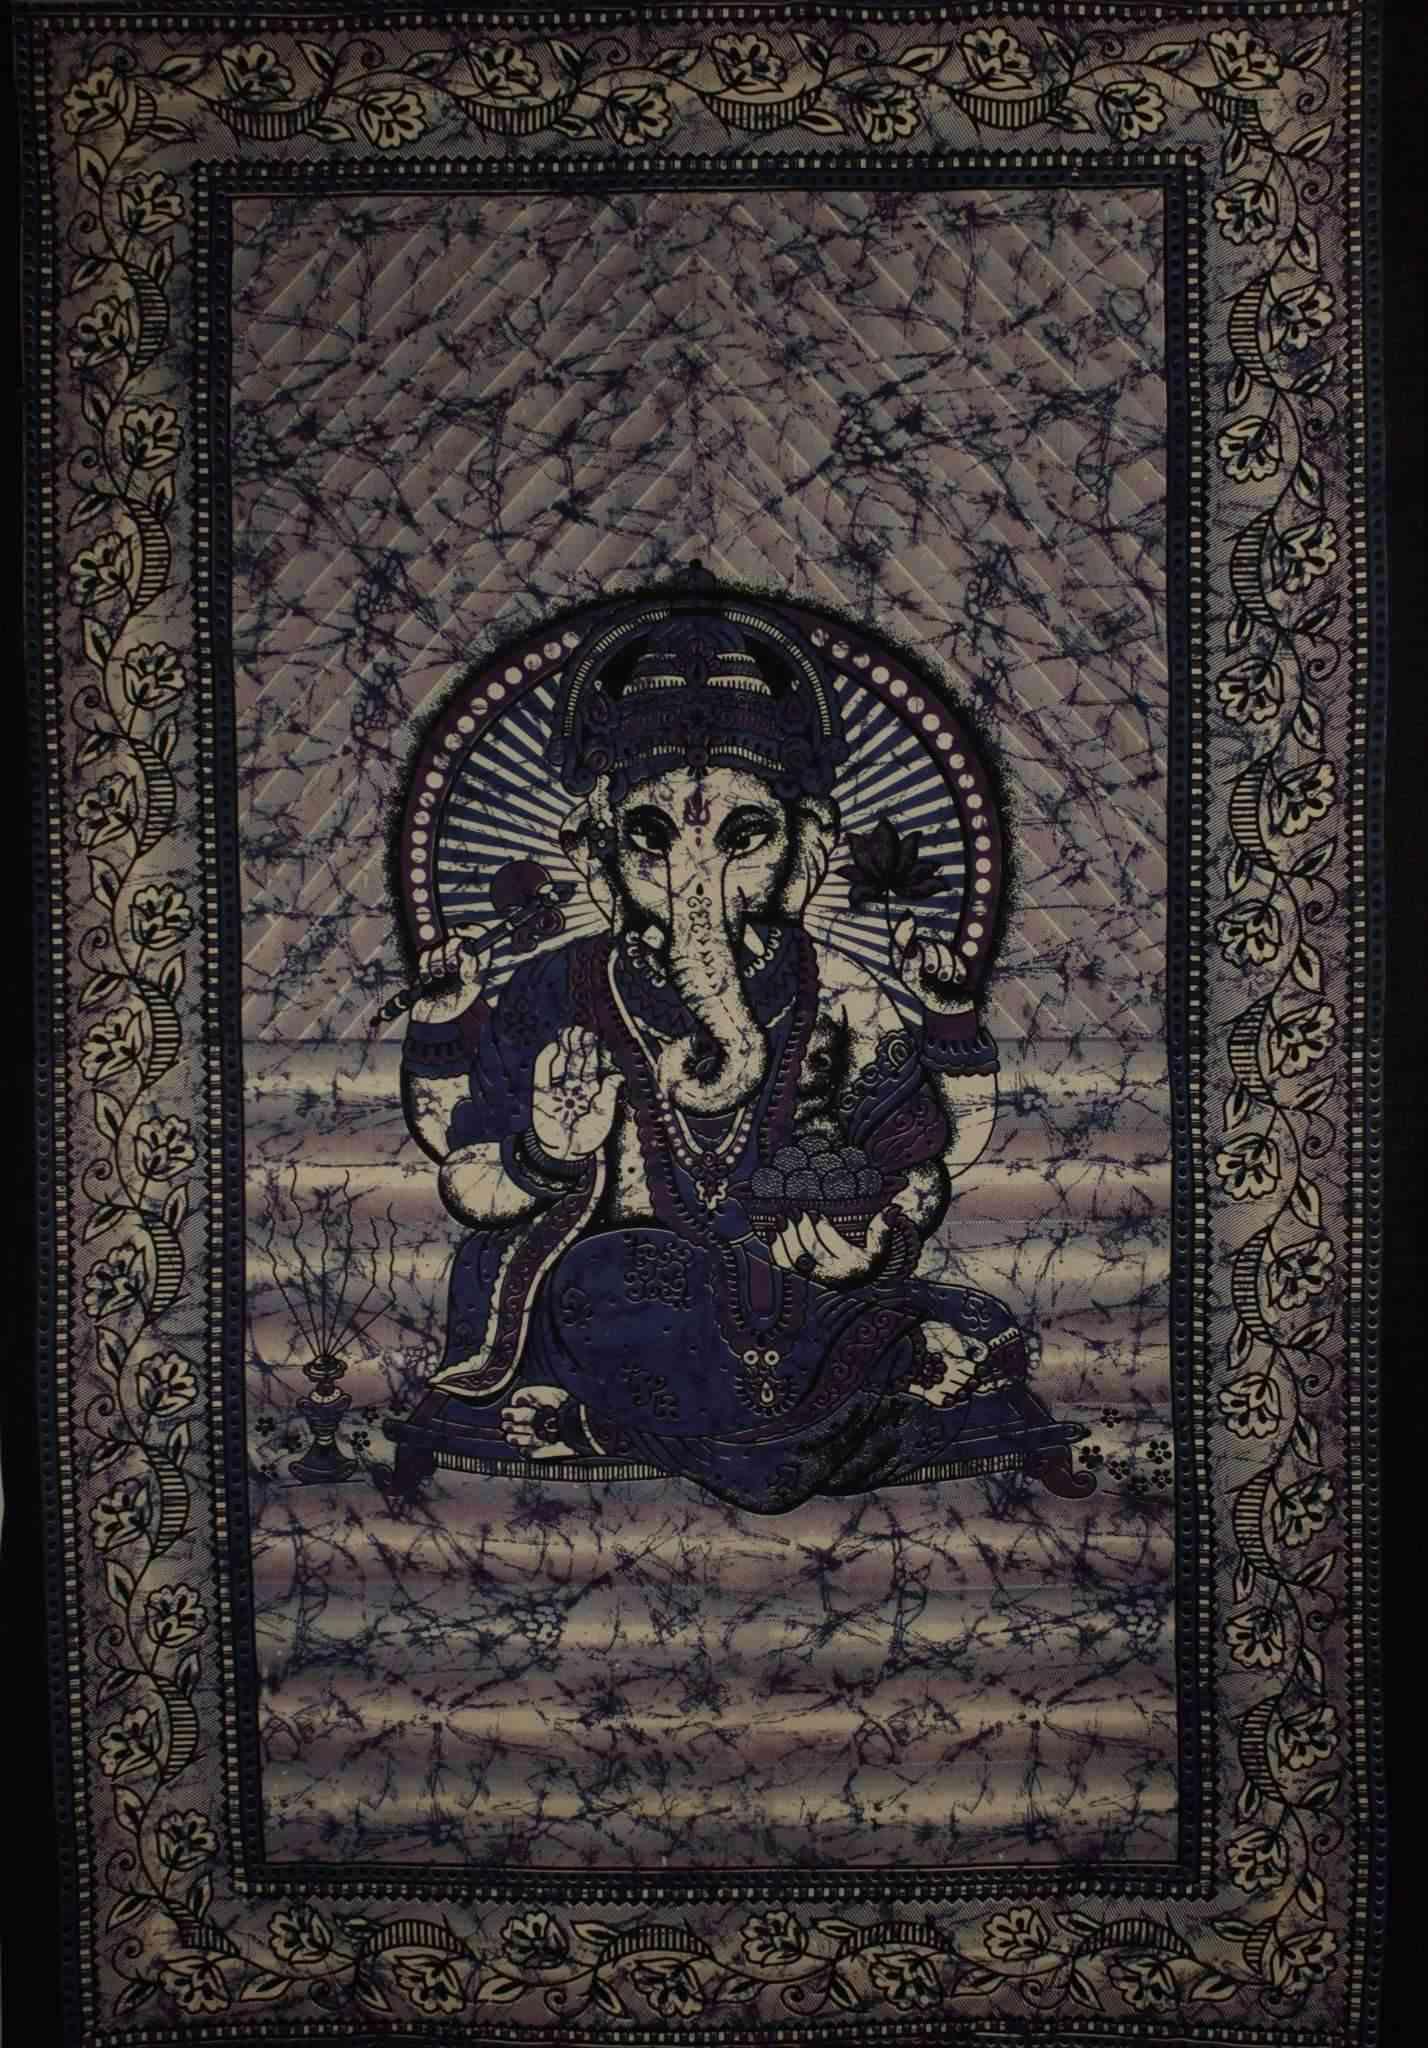 Ganesha Holding Lotus Flower In Batik Style Tapestry